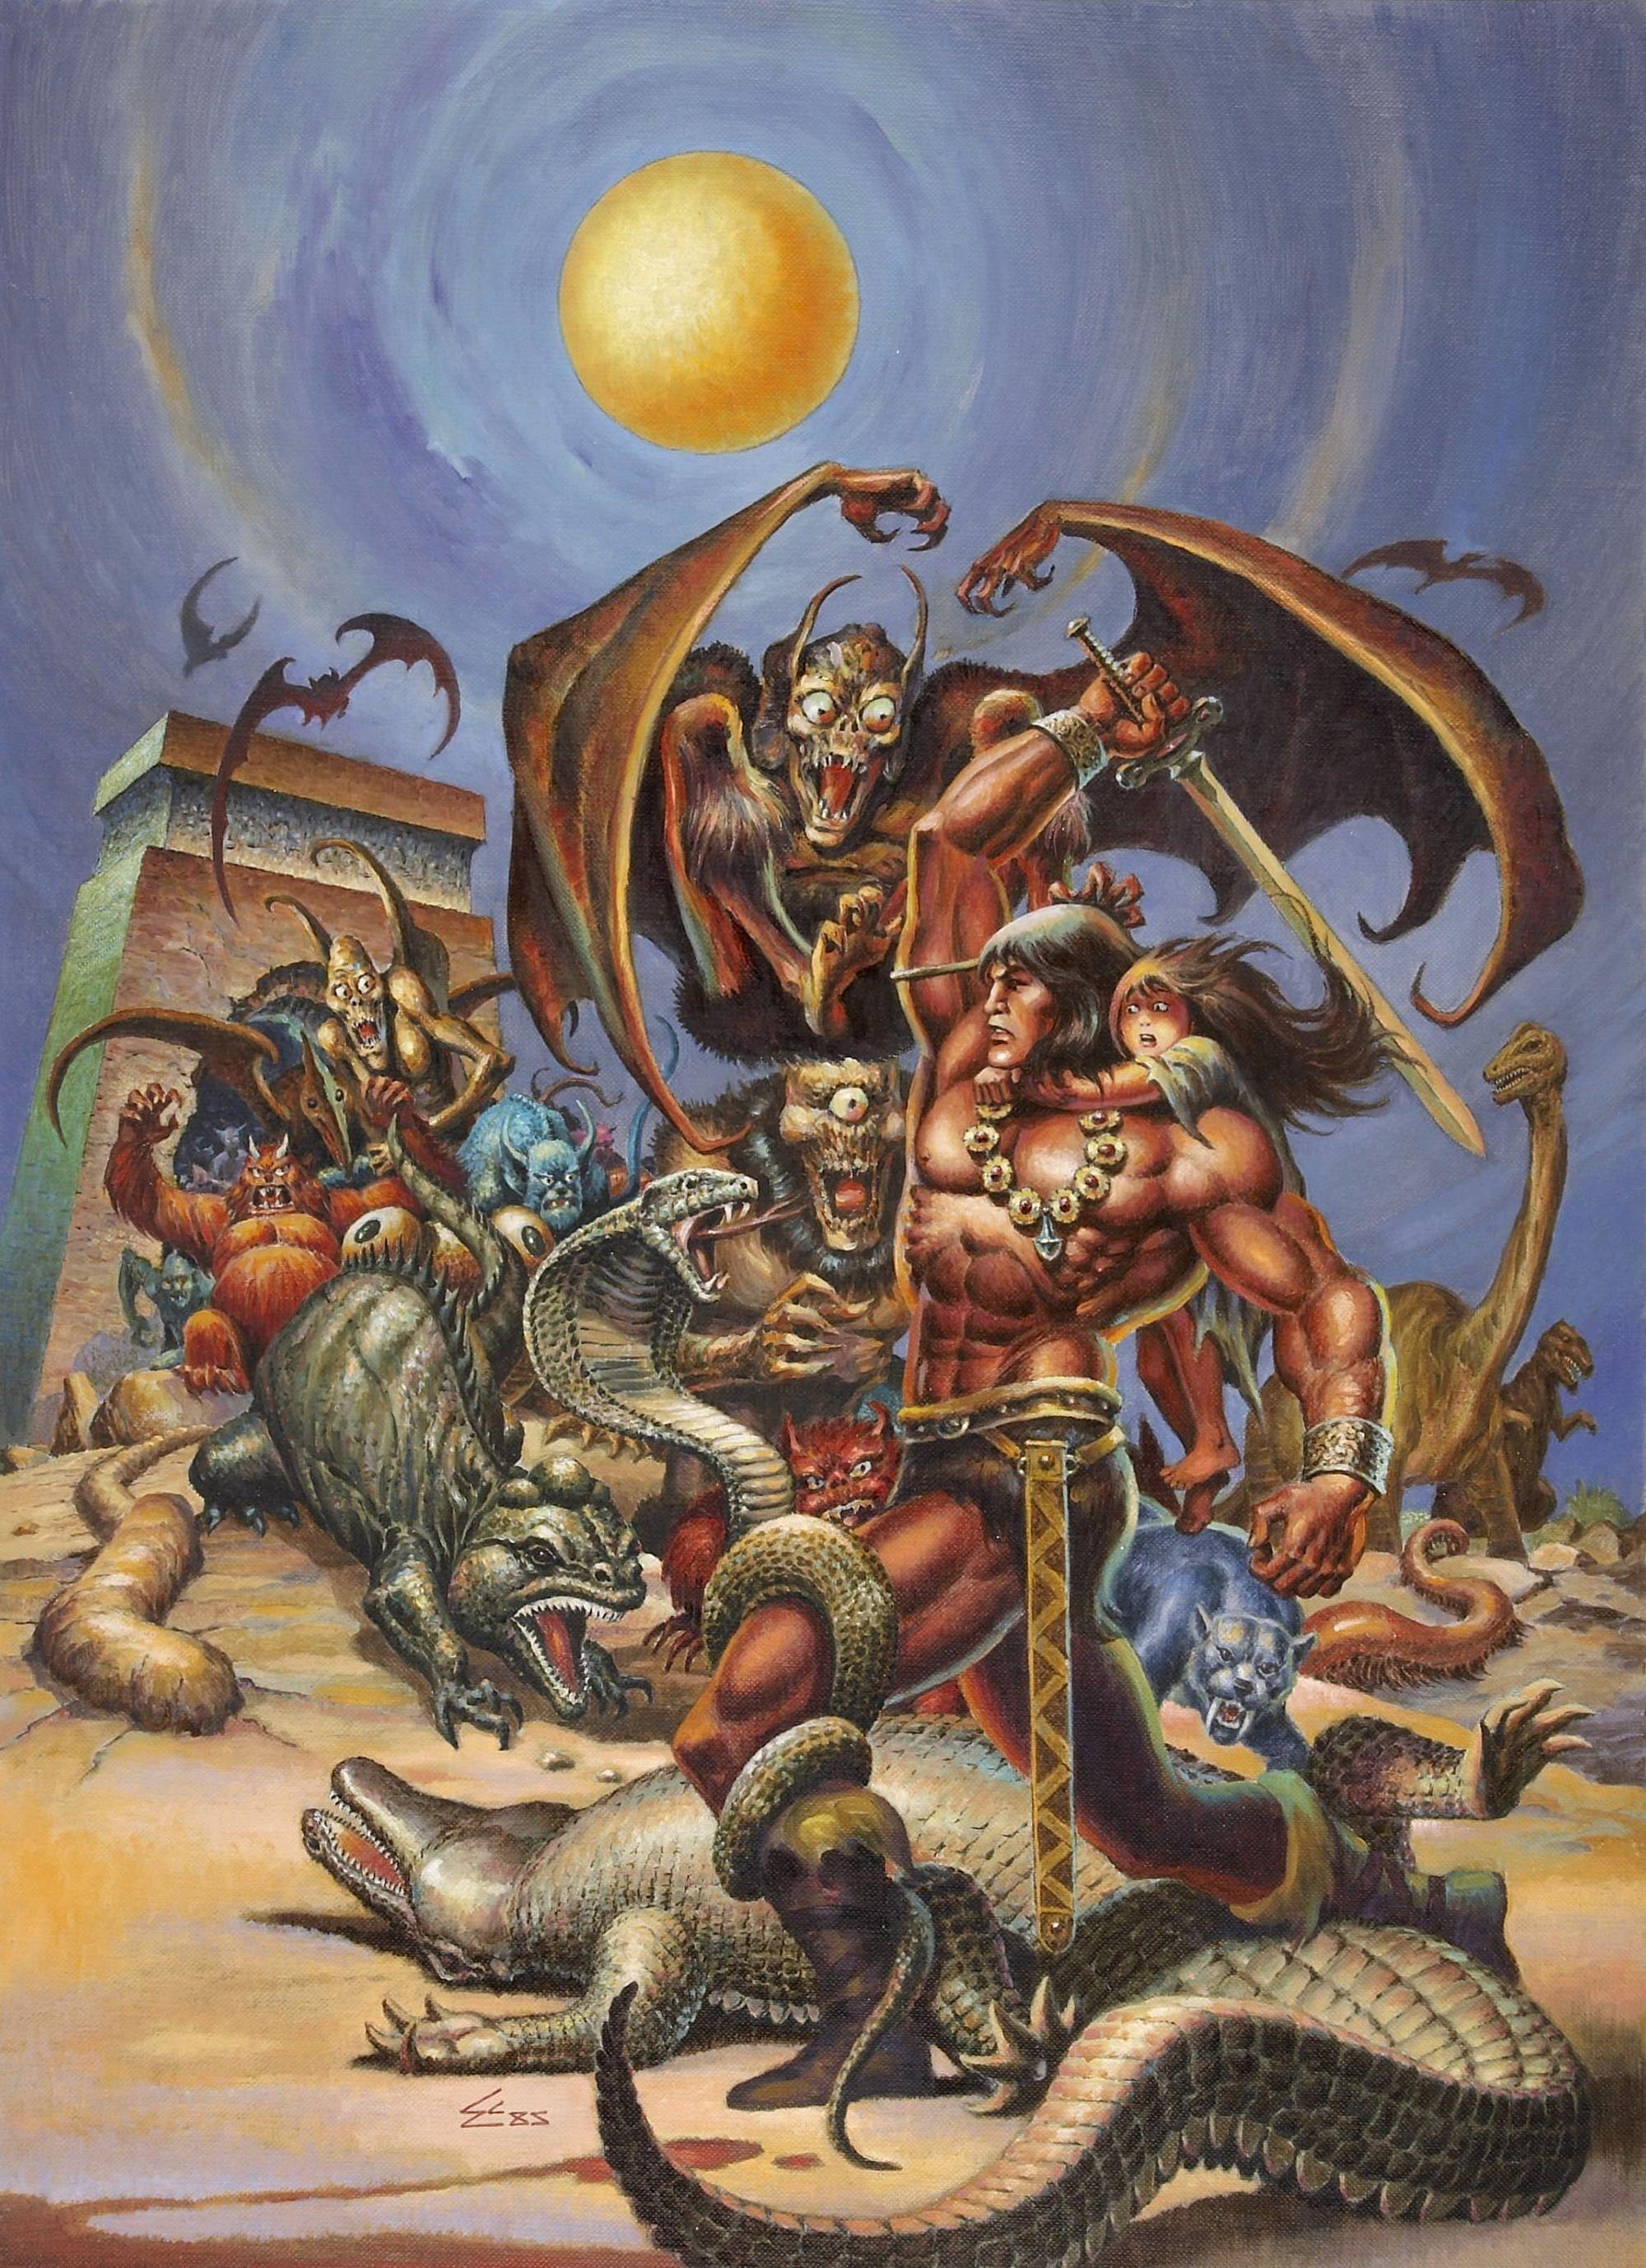 The Savage Sword of Conan #123